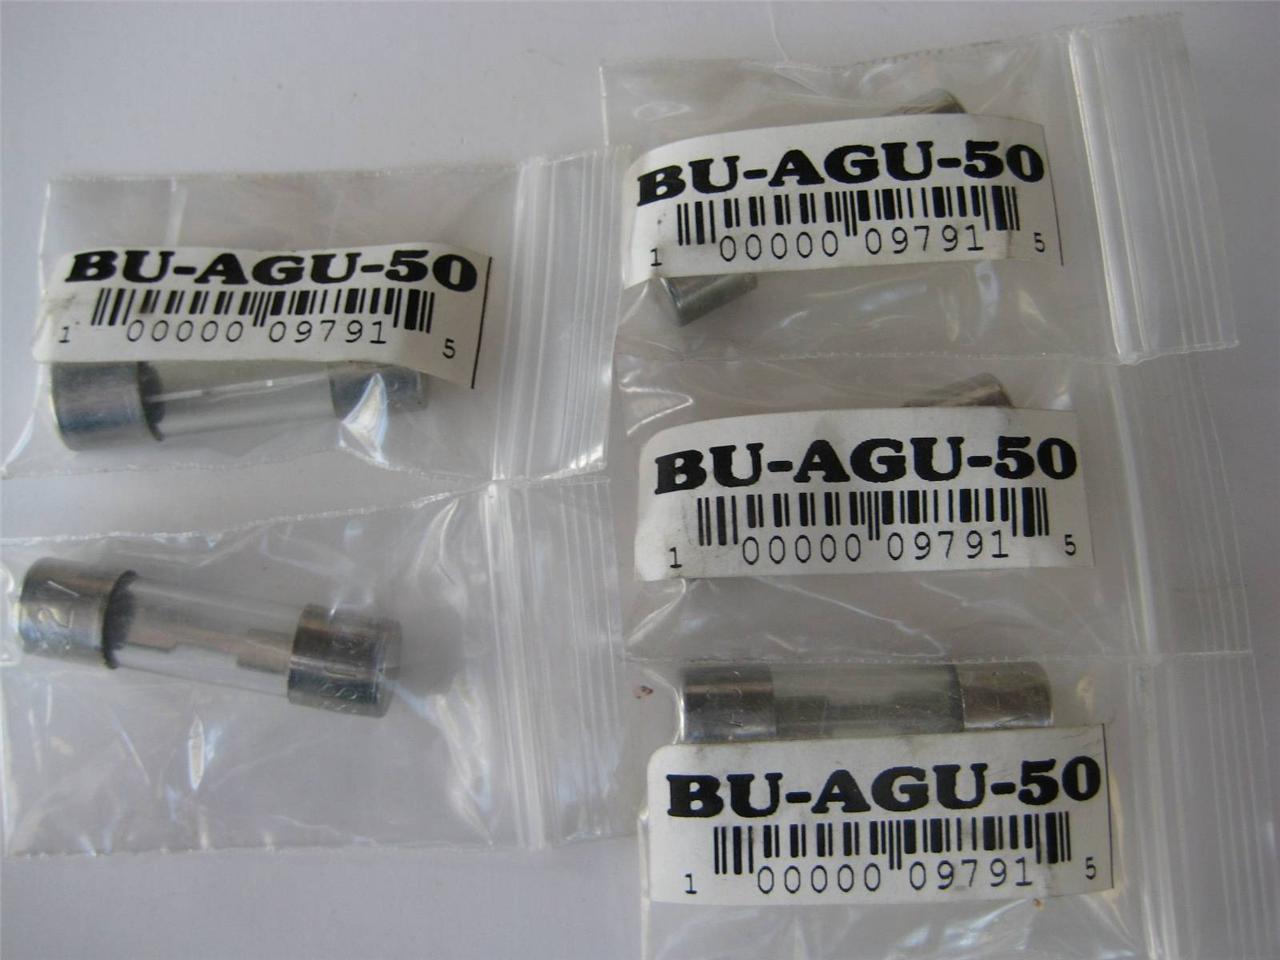 731849128_o 1 or 5 pack bussmann fuse agu 4 10 15 25 30 35 or 60 amp 32v 13 32